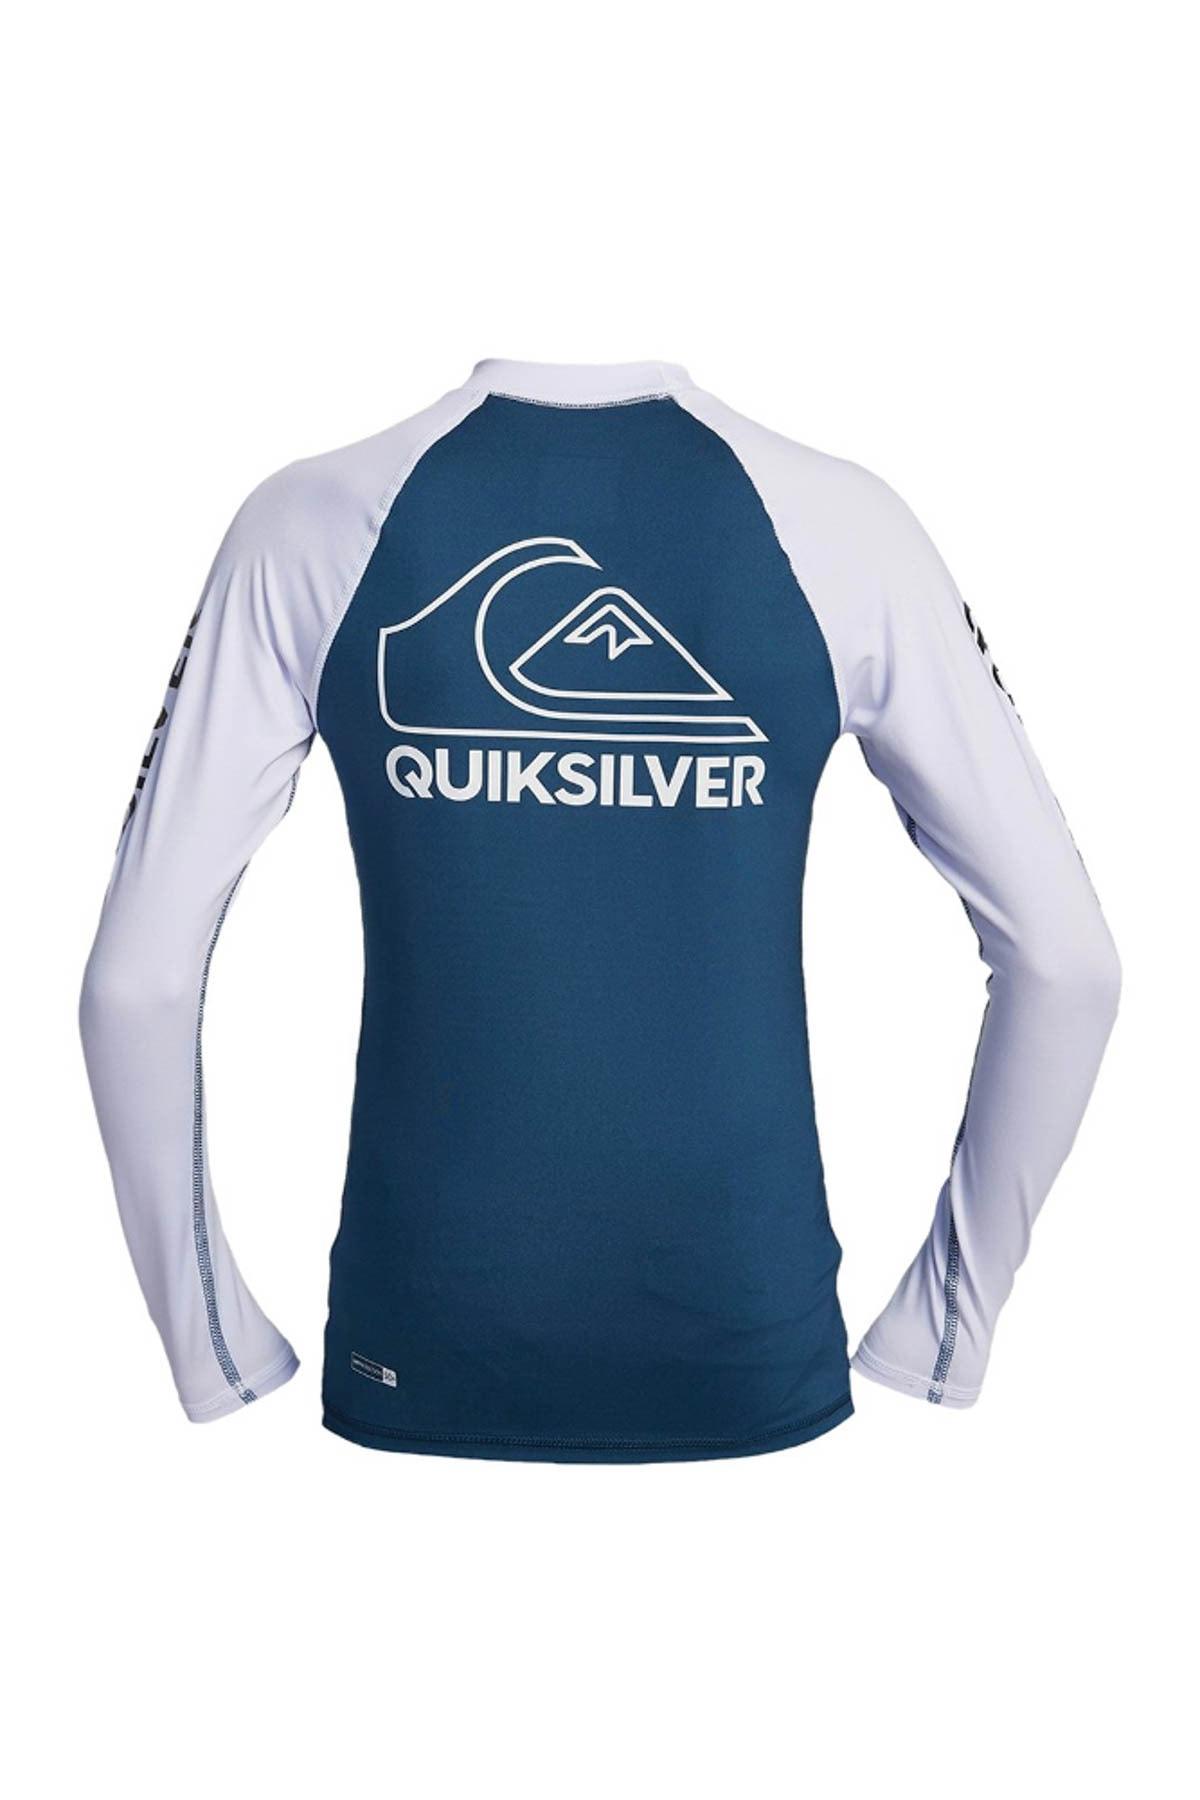 Quiksilver On Tour B SFSH BSM0 Çocuk Lycra 2